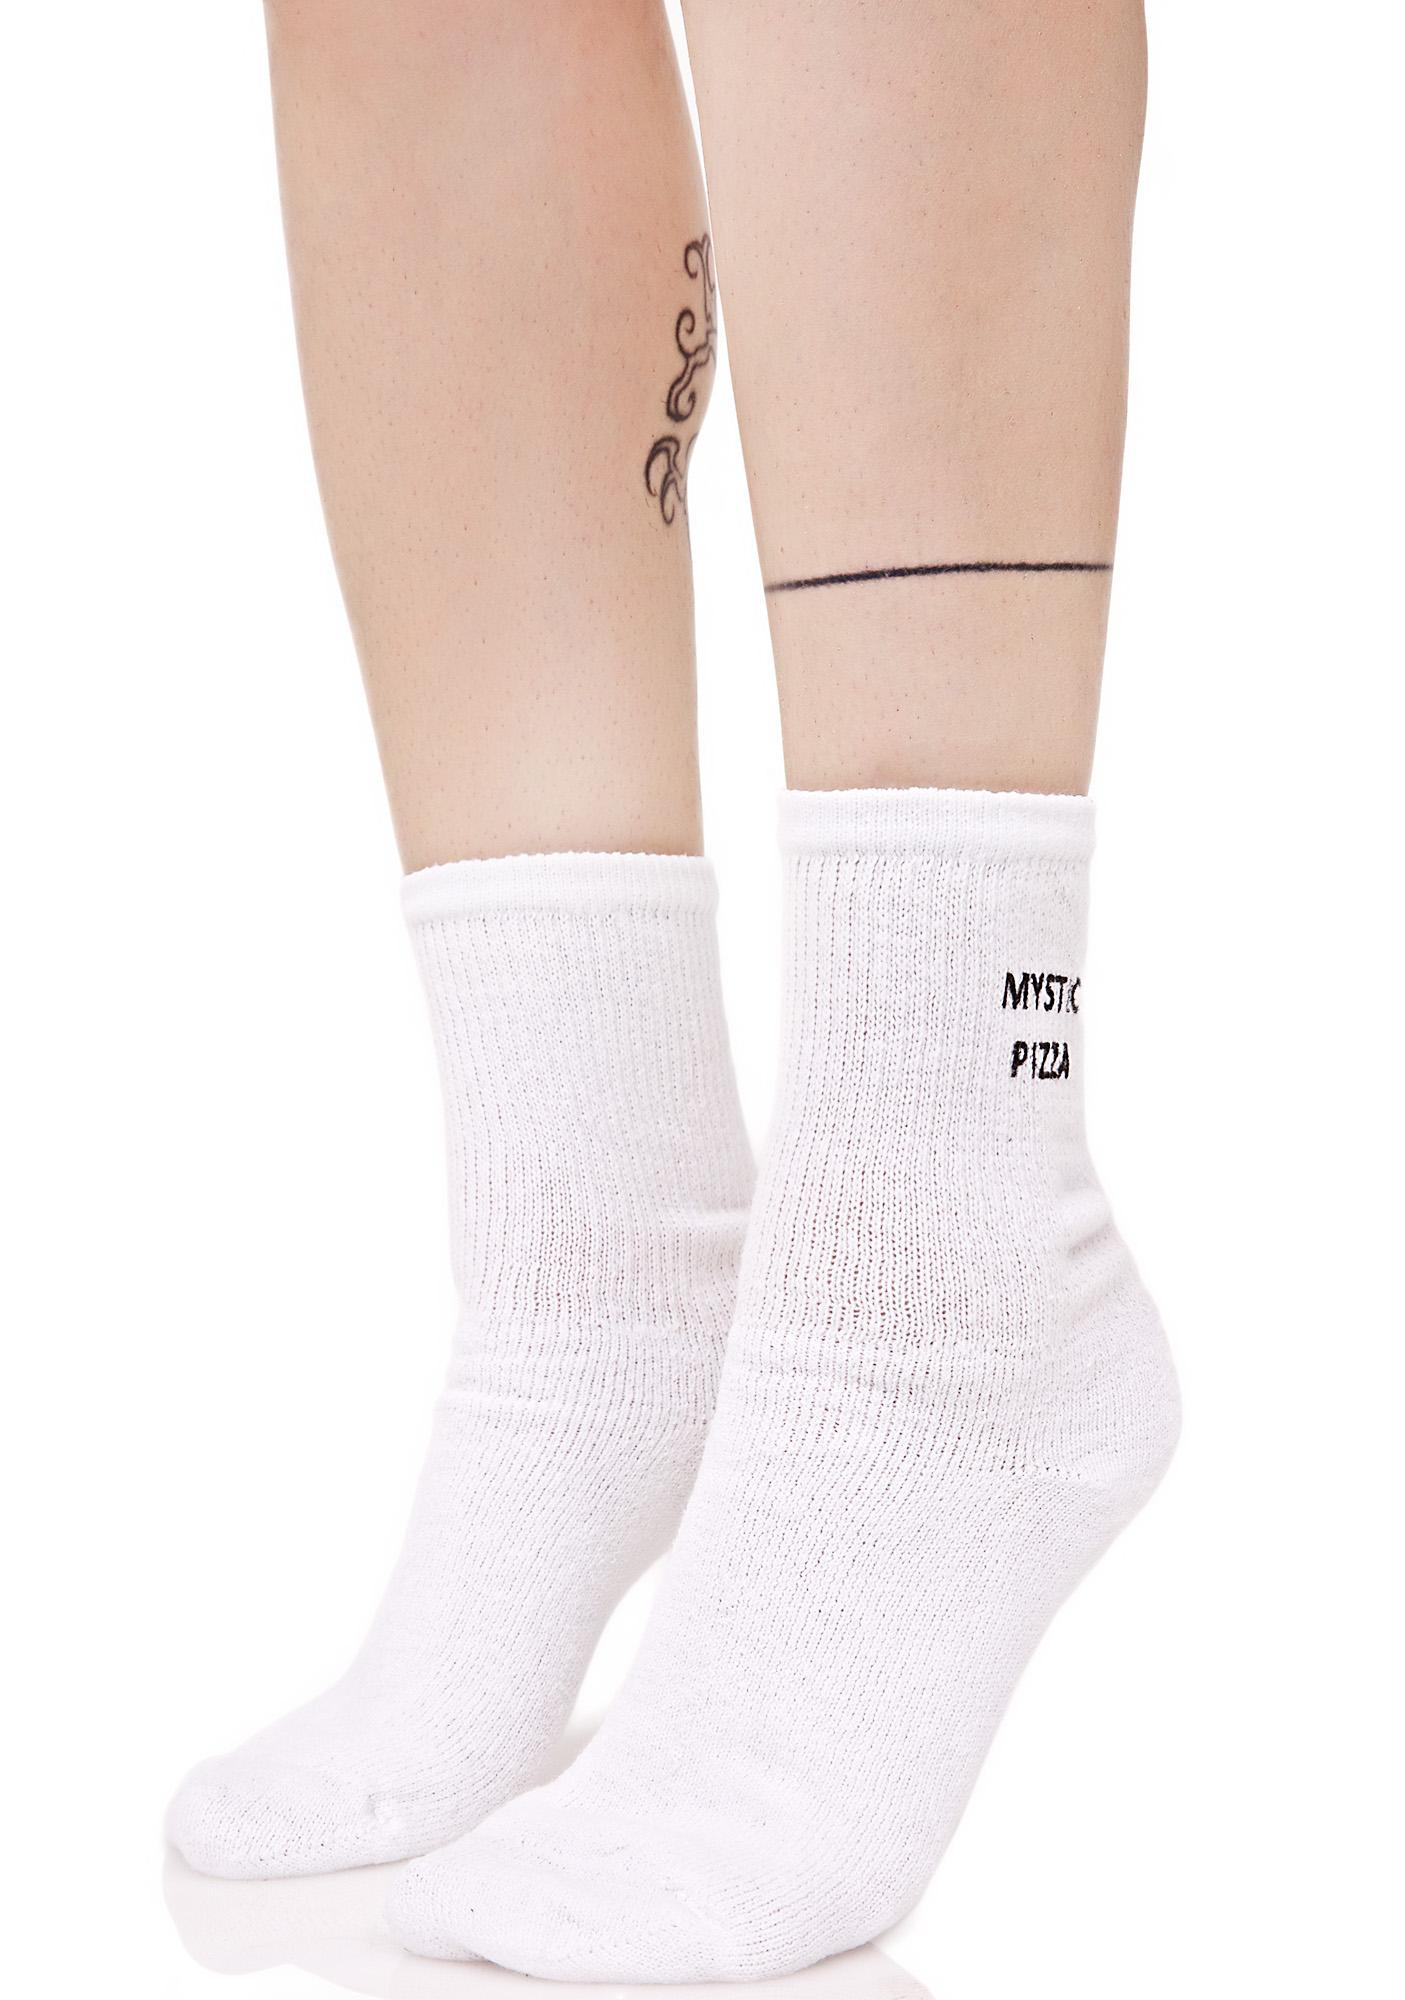 Working Girls Co Mystic Pizza Socks